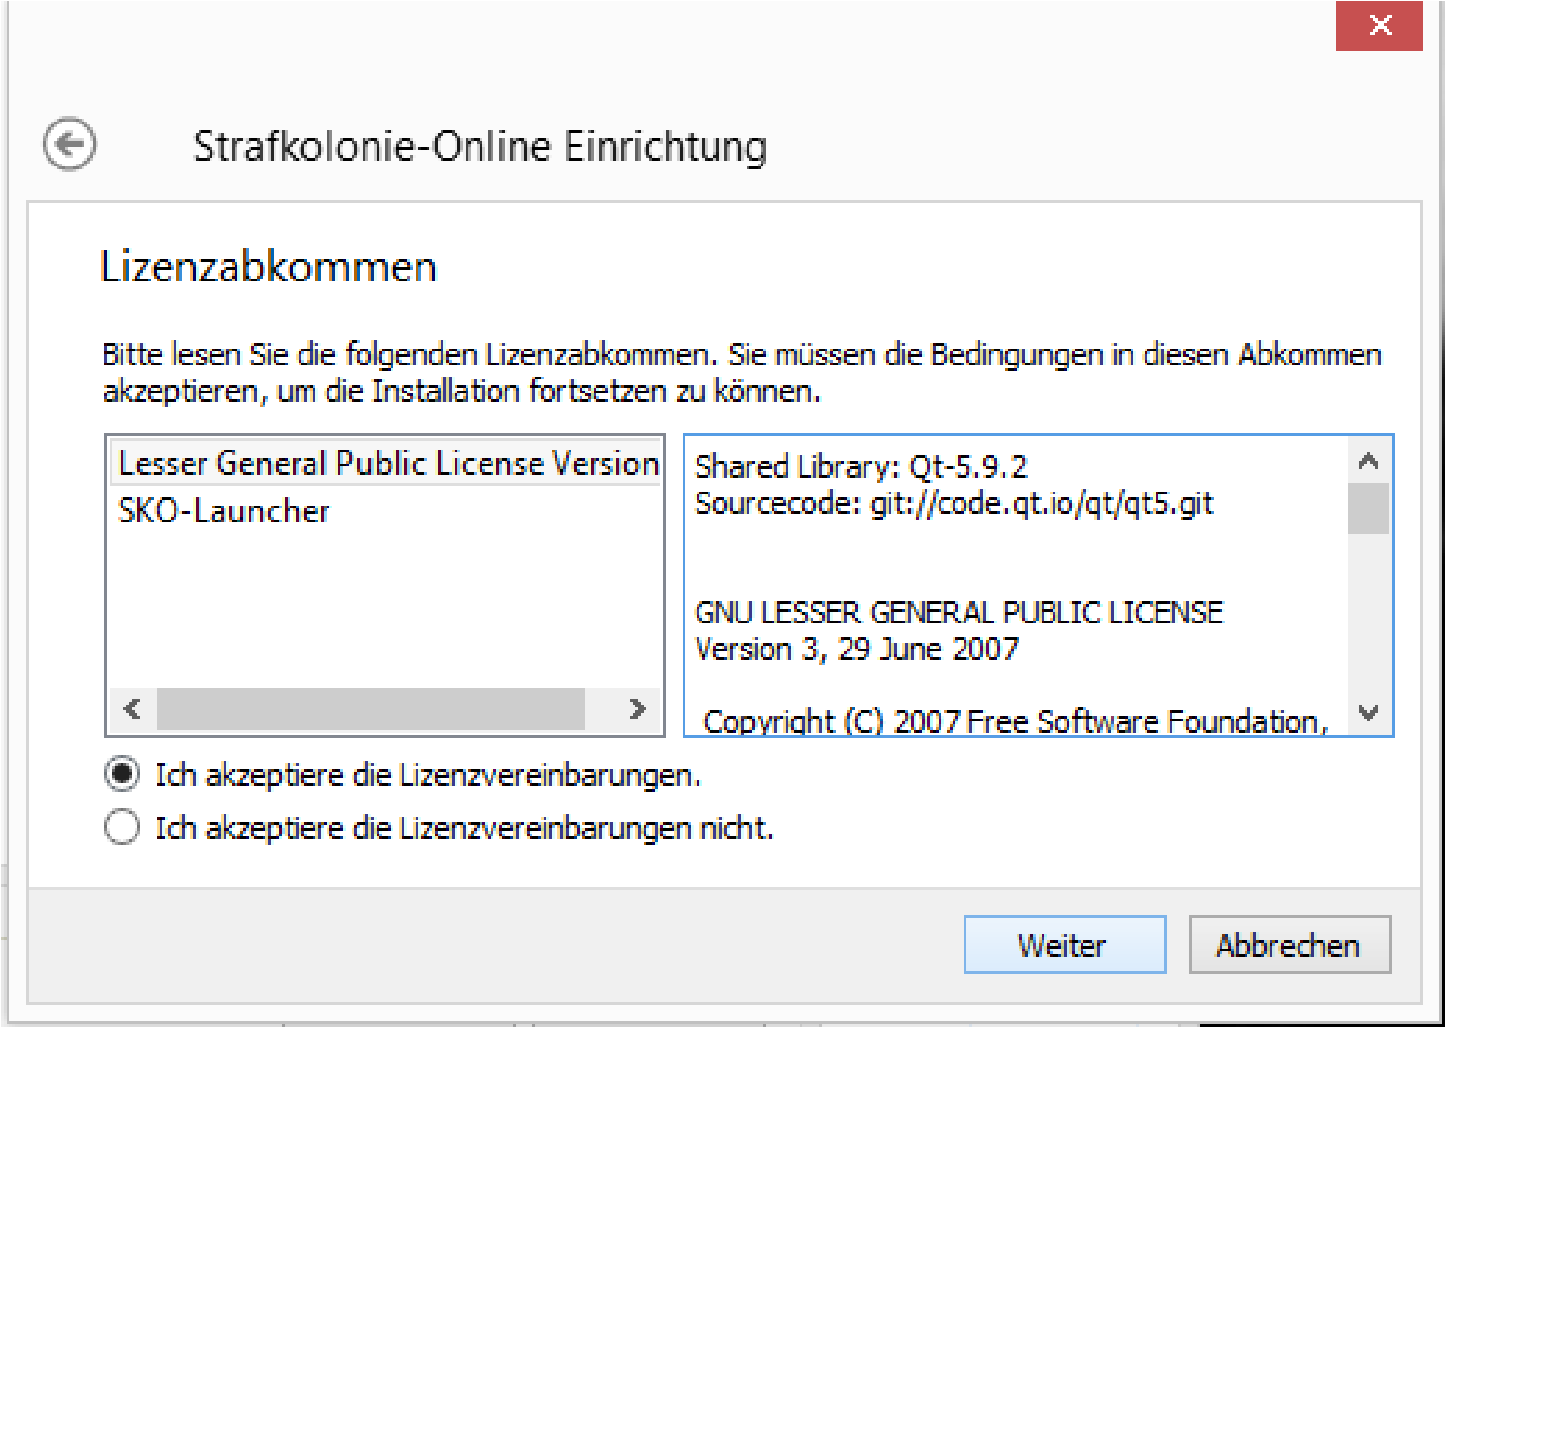 Charmant Barmixer Server Proben Fortsetzen Galerie - Entry Level ...